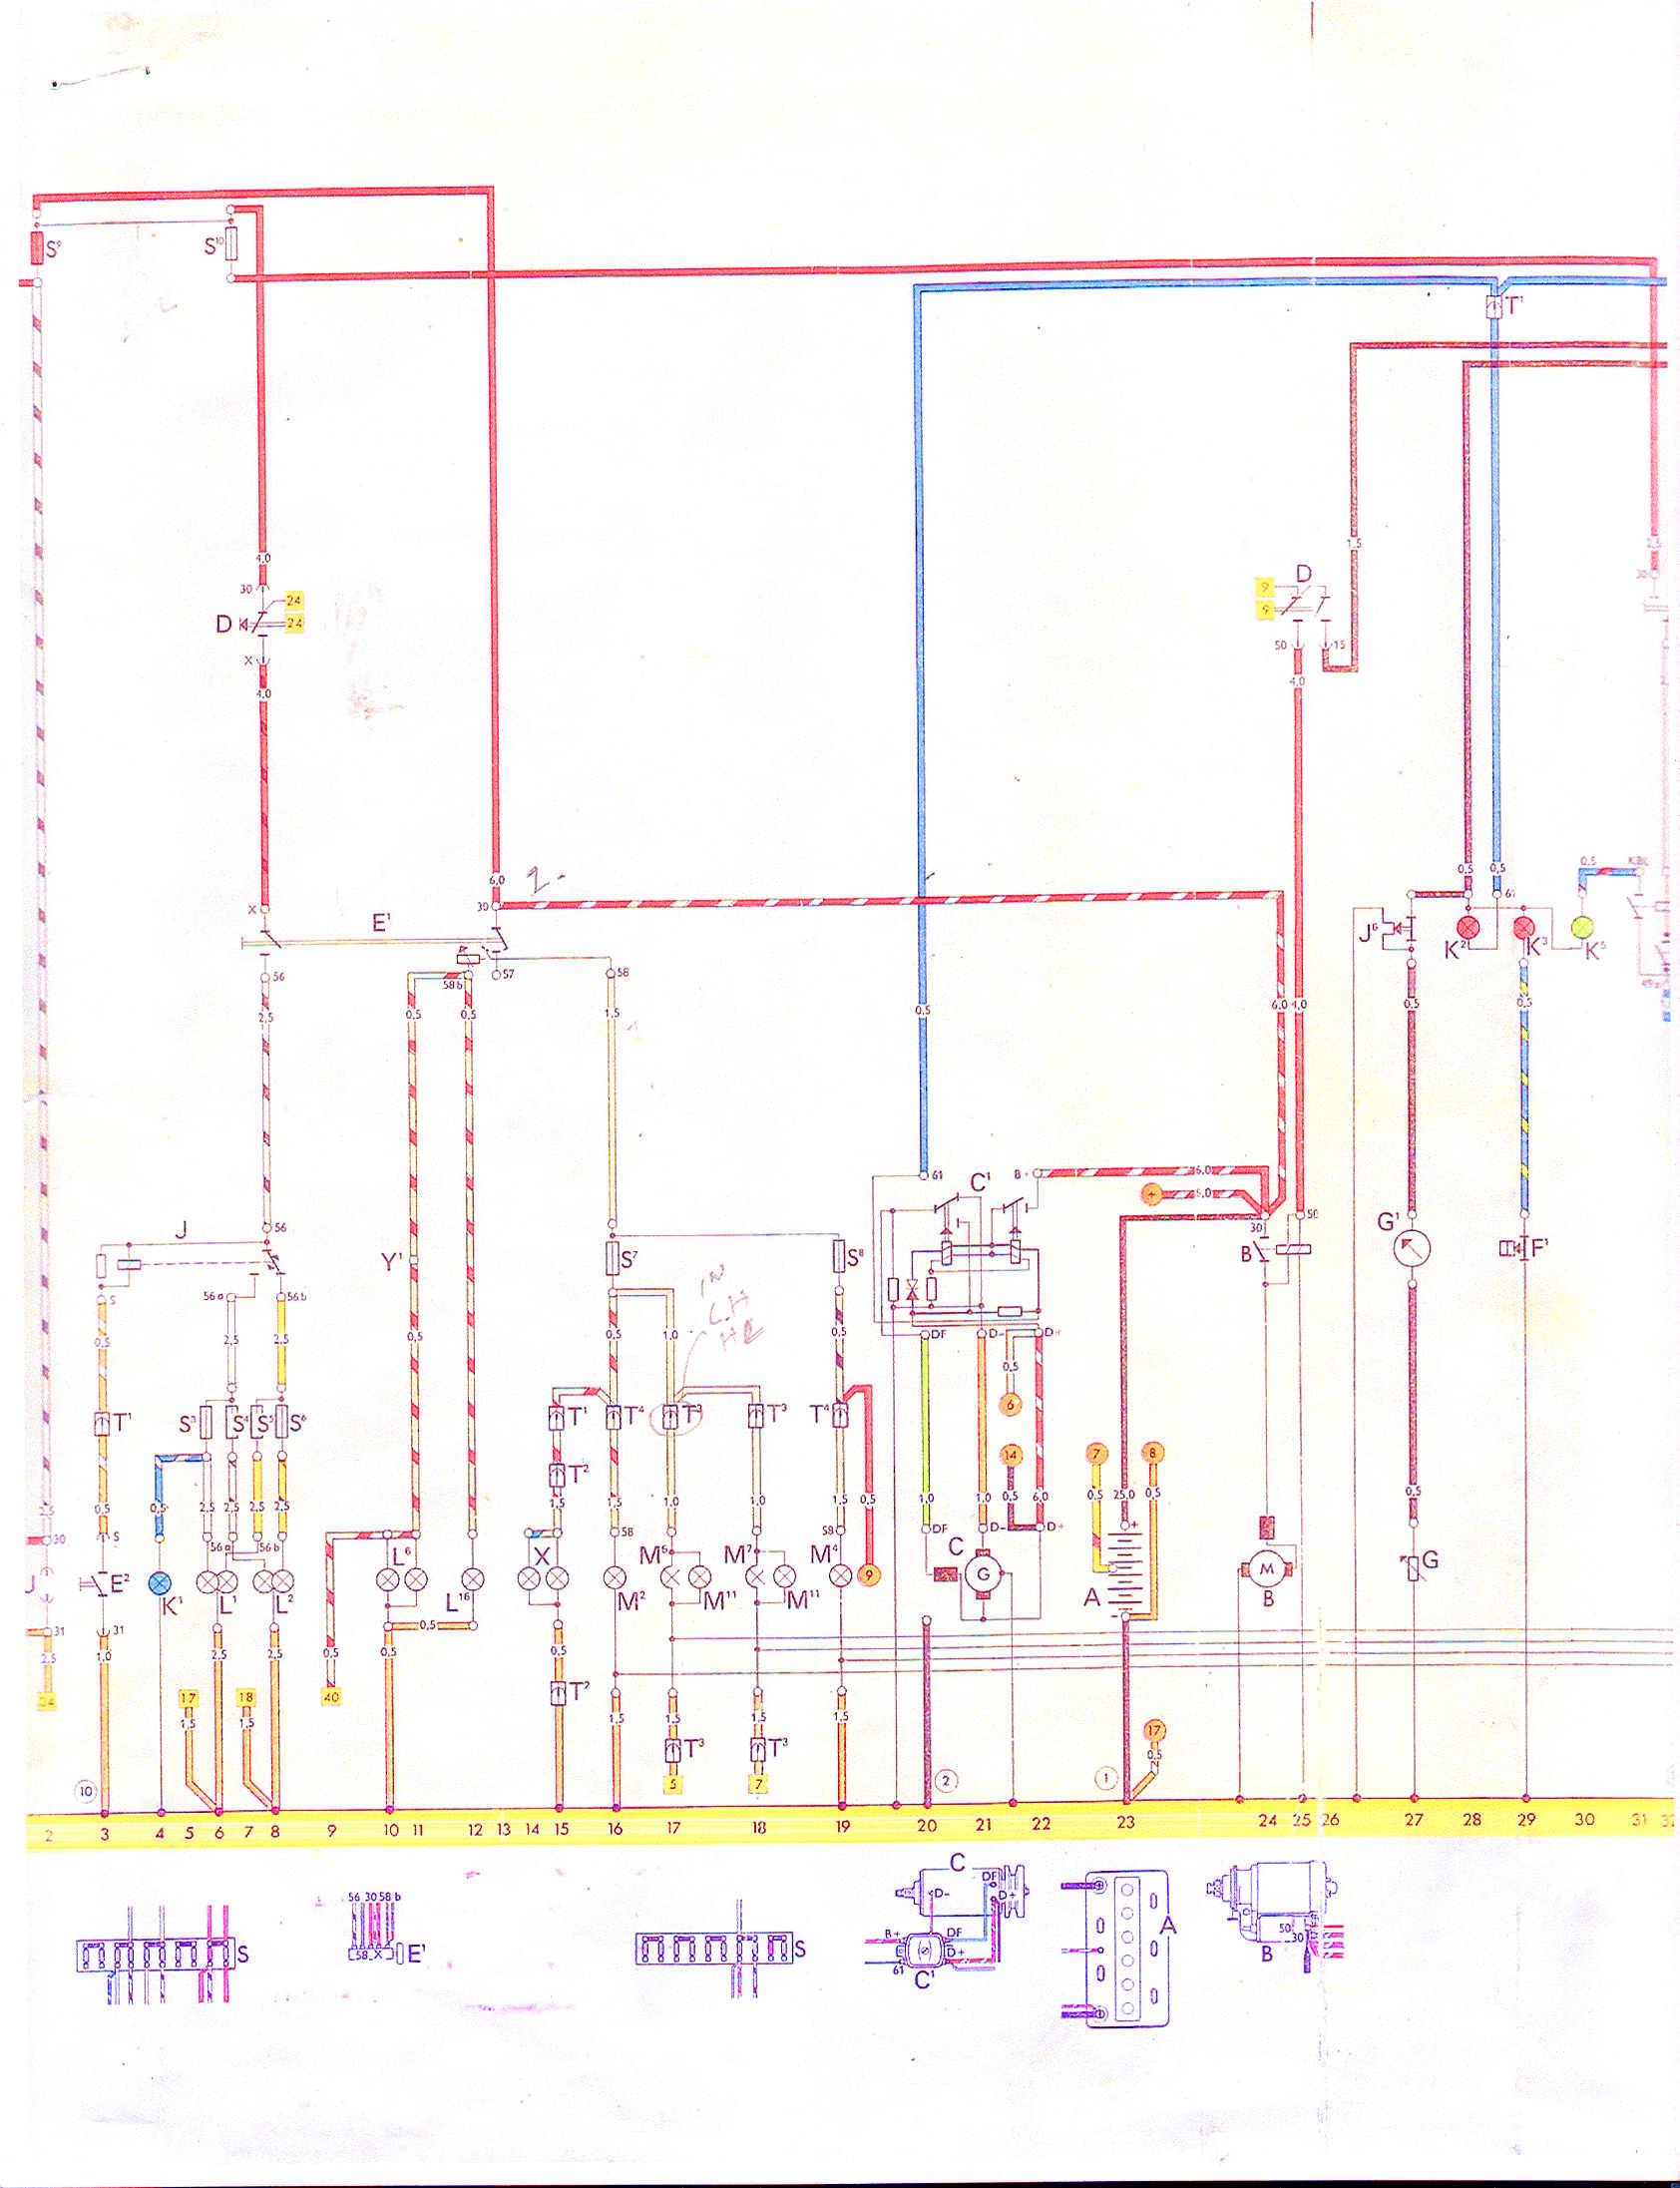 wiring vw thing type 181 restoration vw engine wiring diagram 1973 vw thing wiring diagram [ 1684 x 2193 Pixel ]